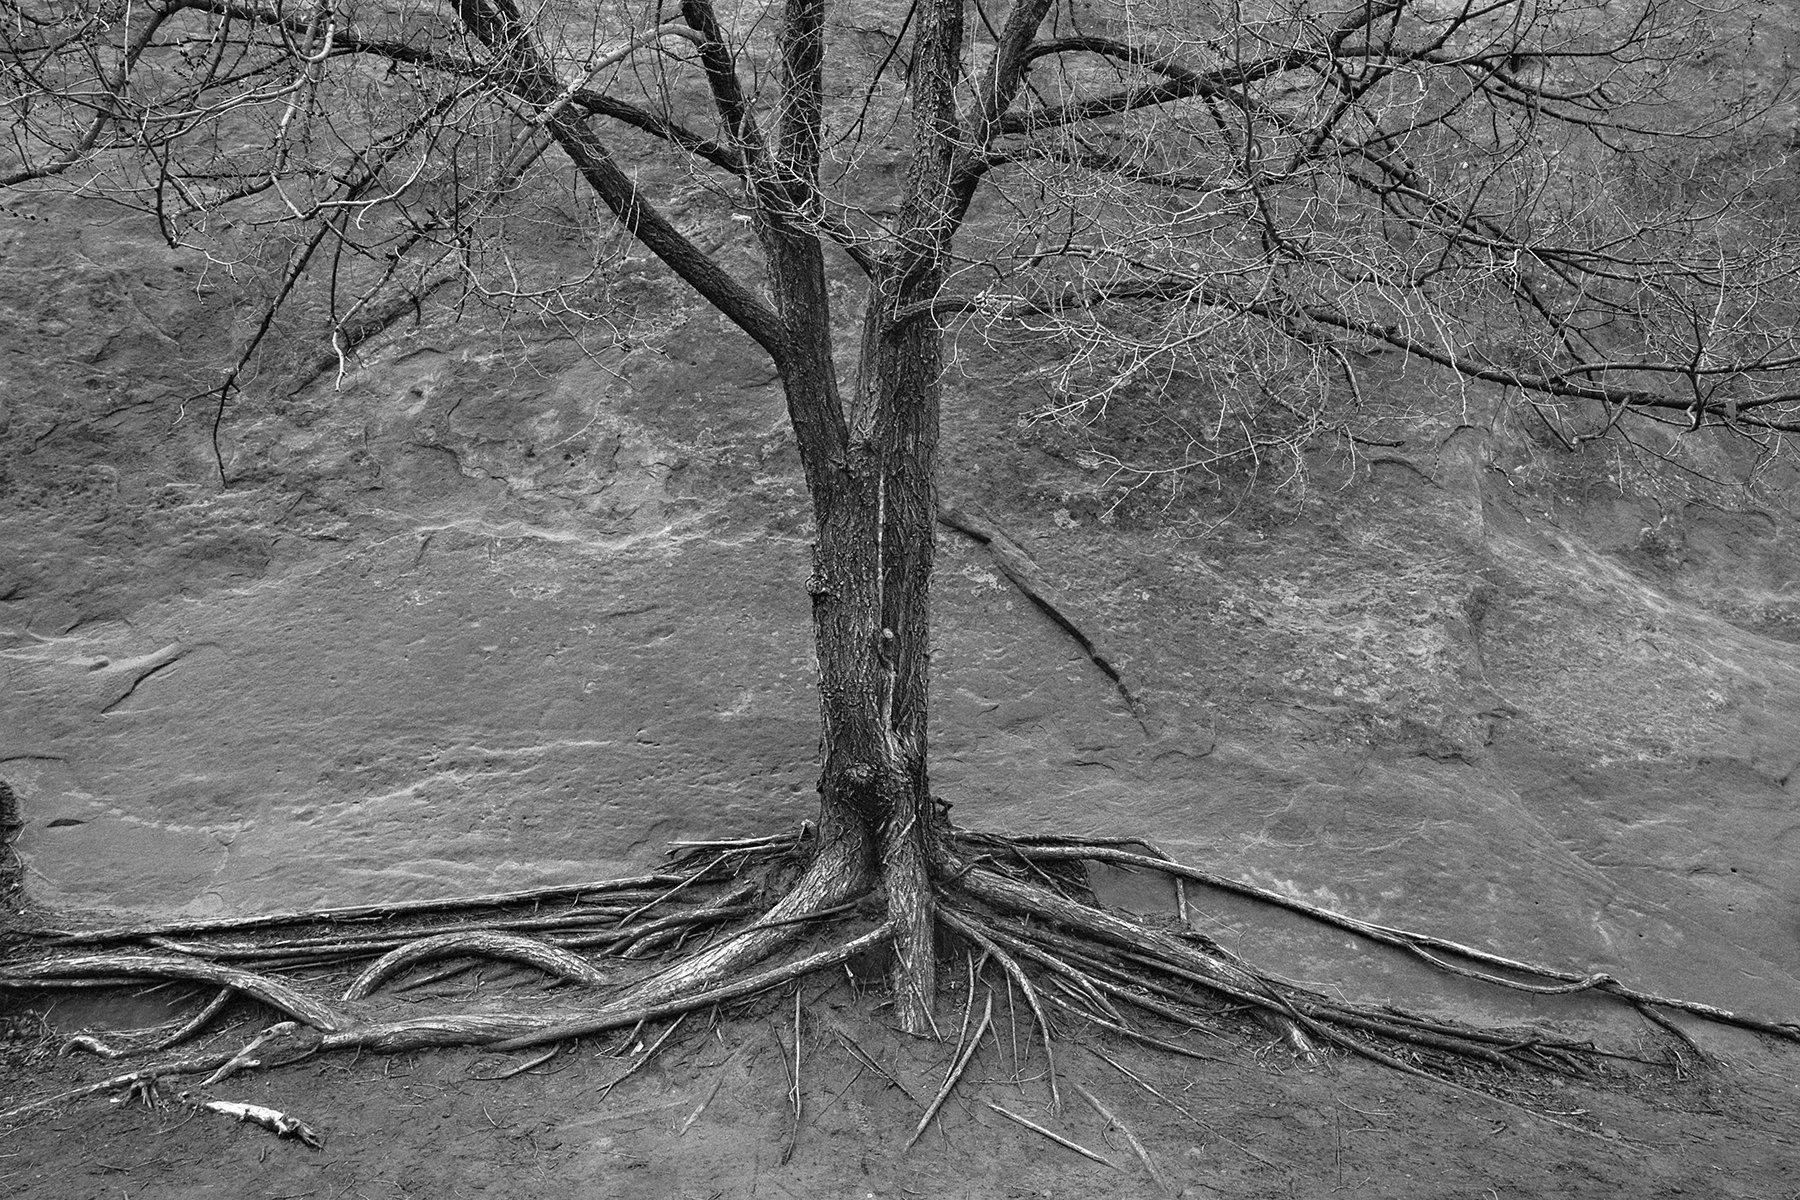 colorado-springs-landscape-black-and-white031.jpg